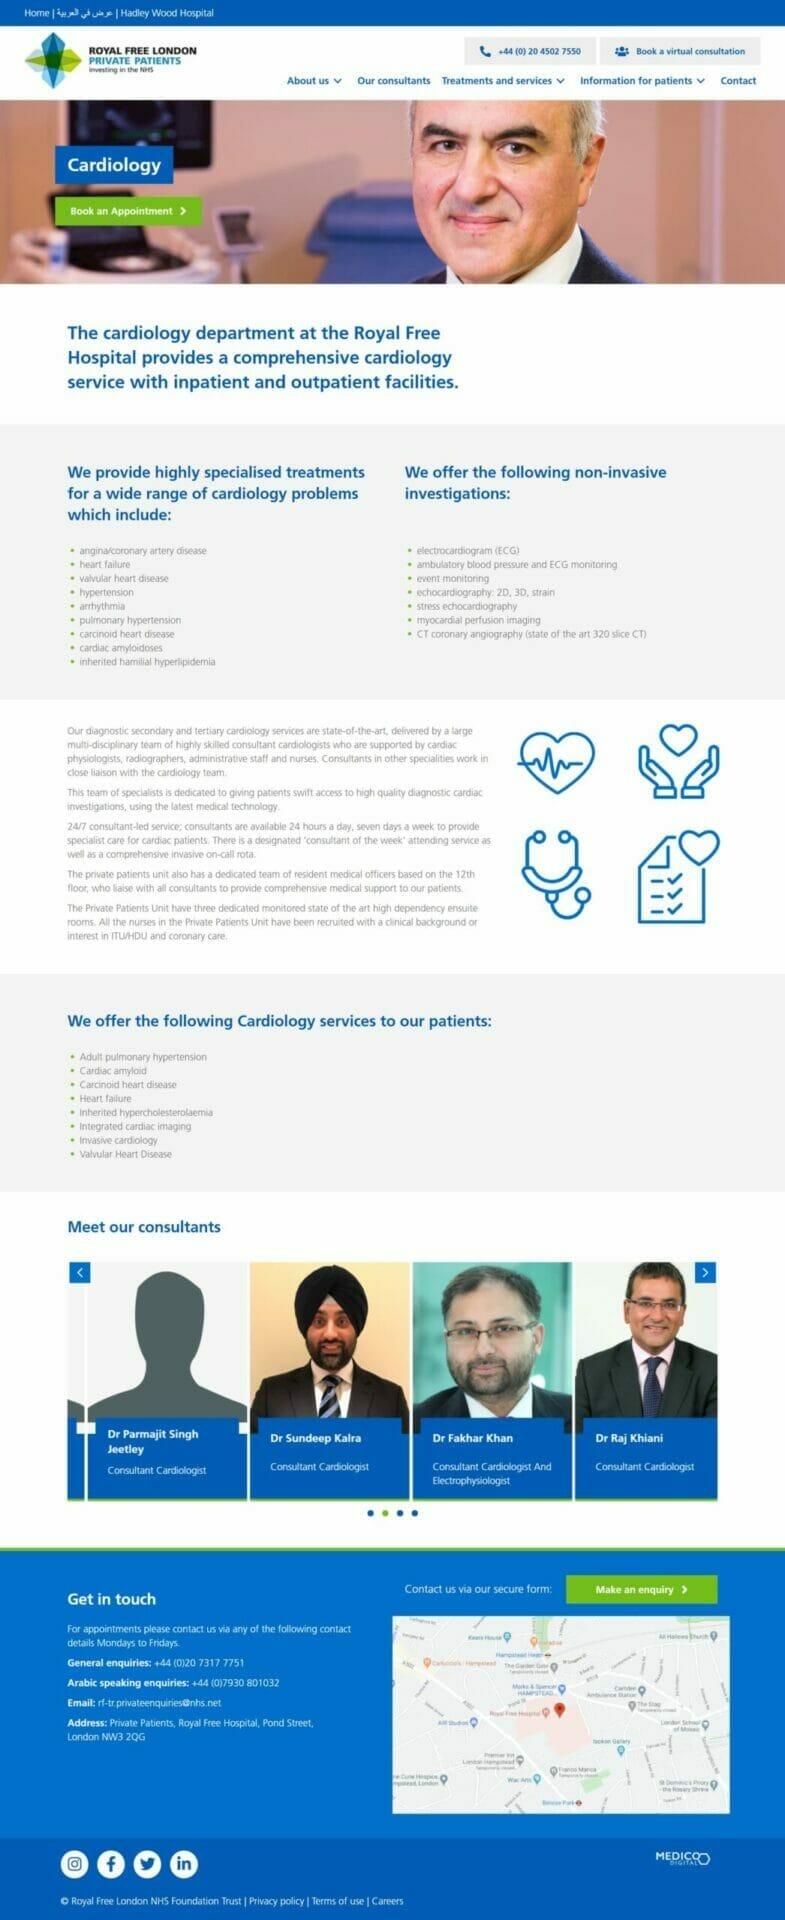 FireShot Capture 560 - Cardiology - Royal Free Private Patients Unit_ - www.royalfreeprivatepatients.com